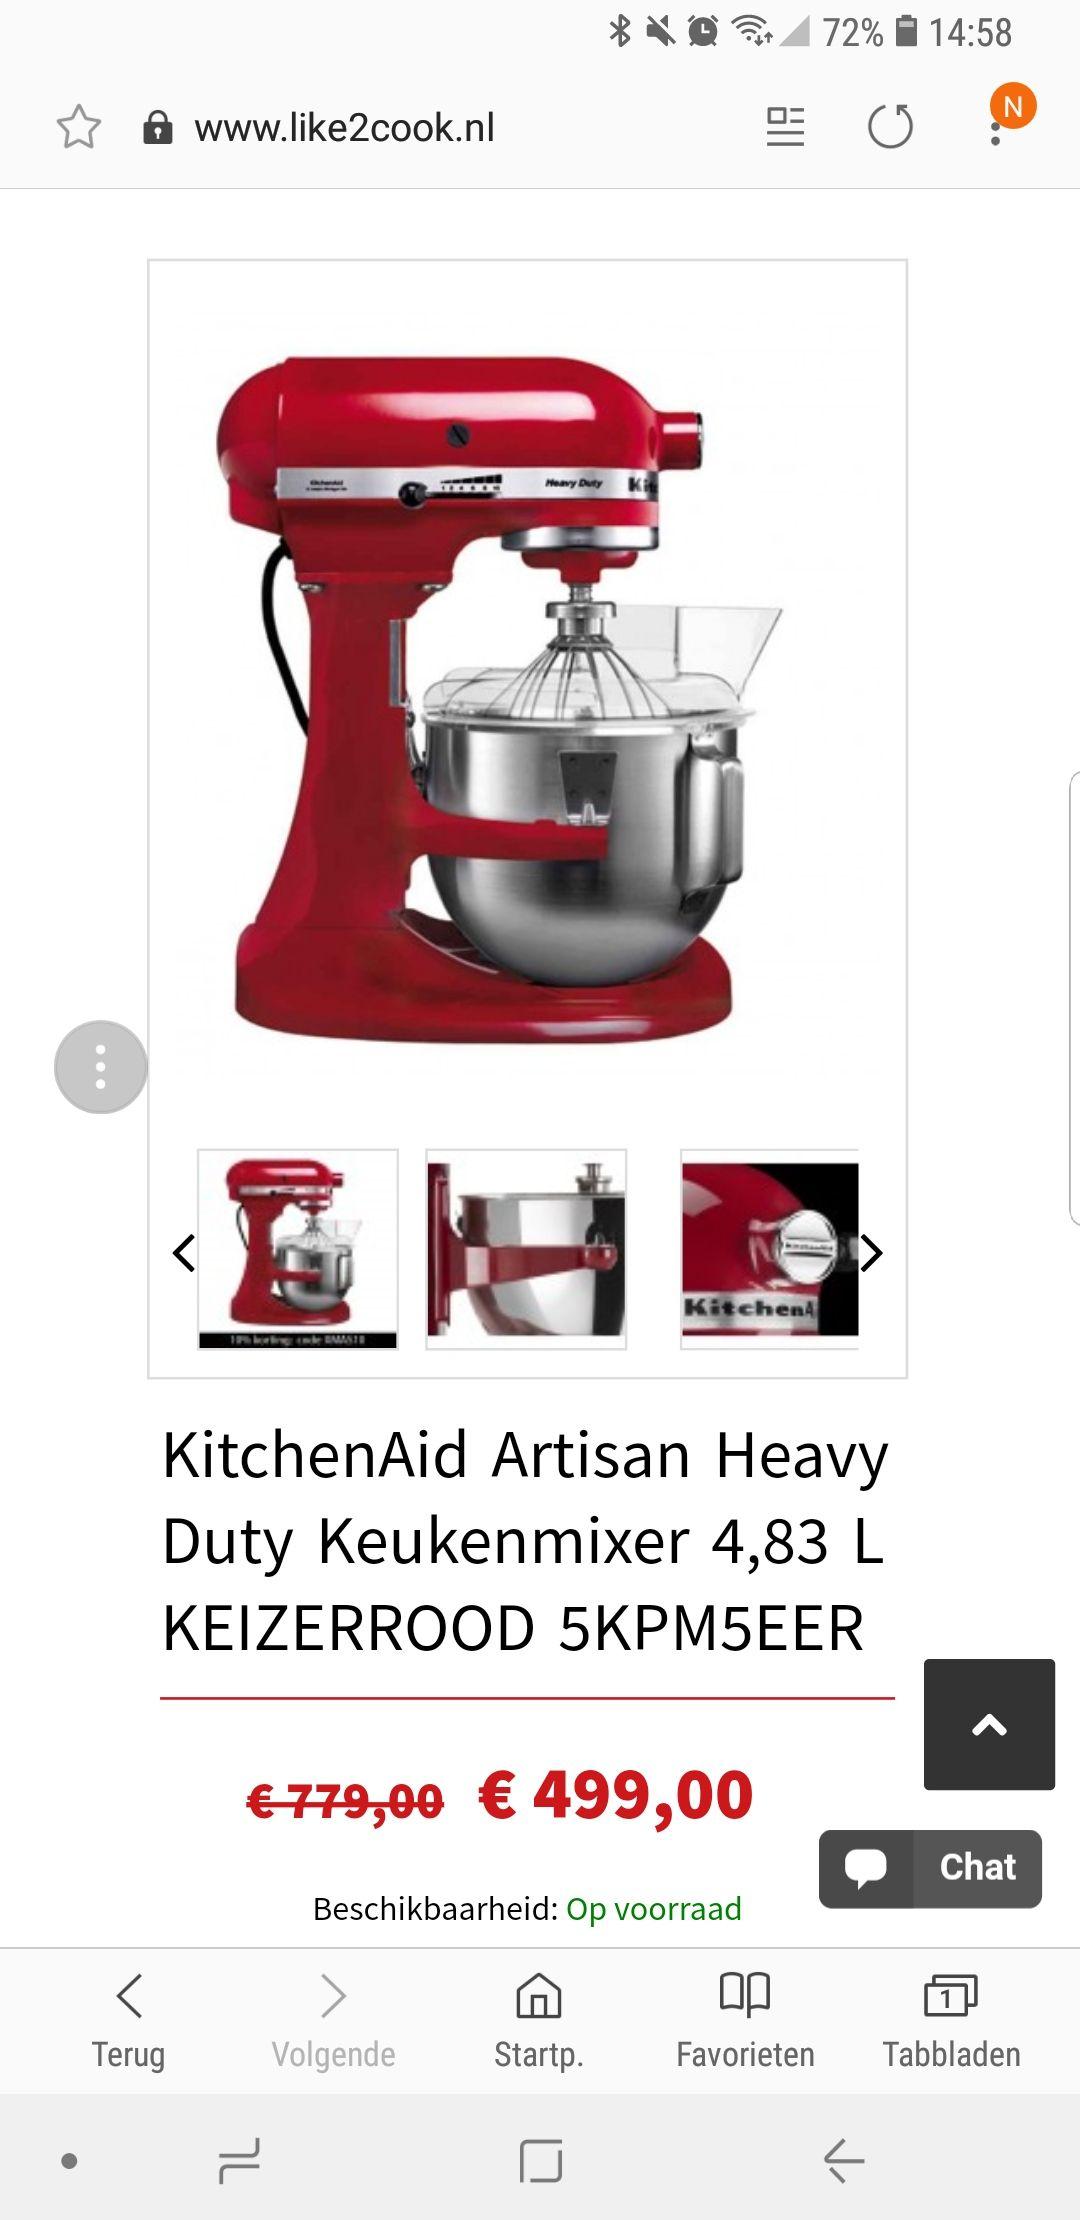 KitchenAid Artisan Heavy Duty Keukenmixer 4,83 L KEIZERROOD 5KPM5EER